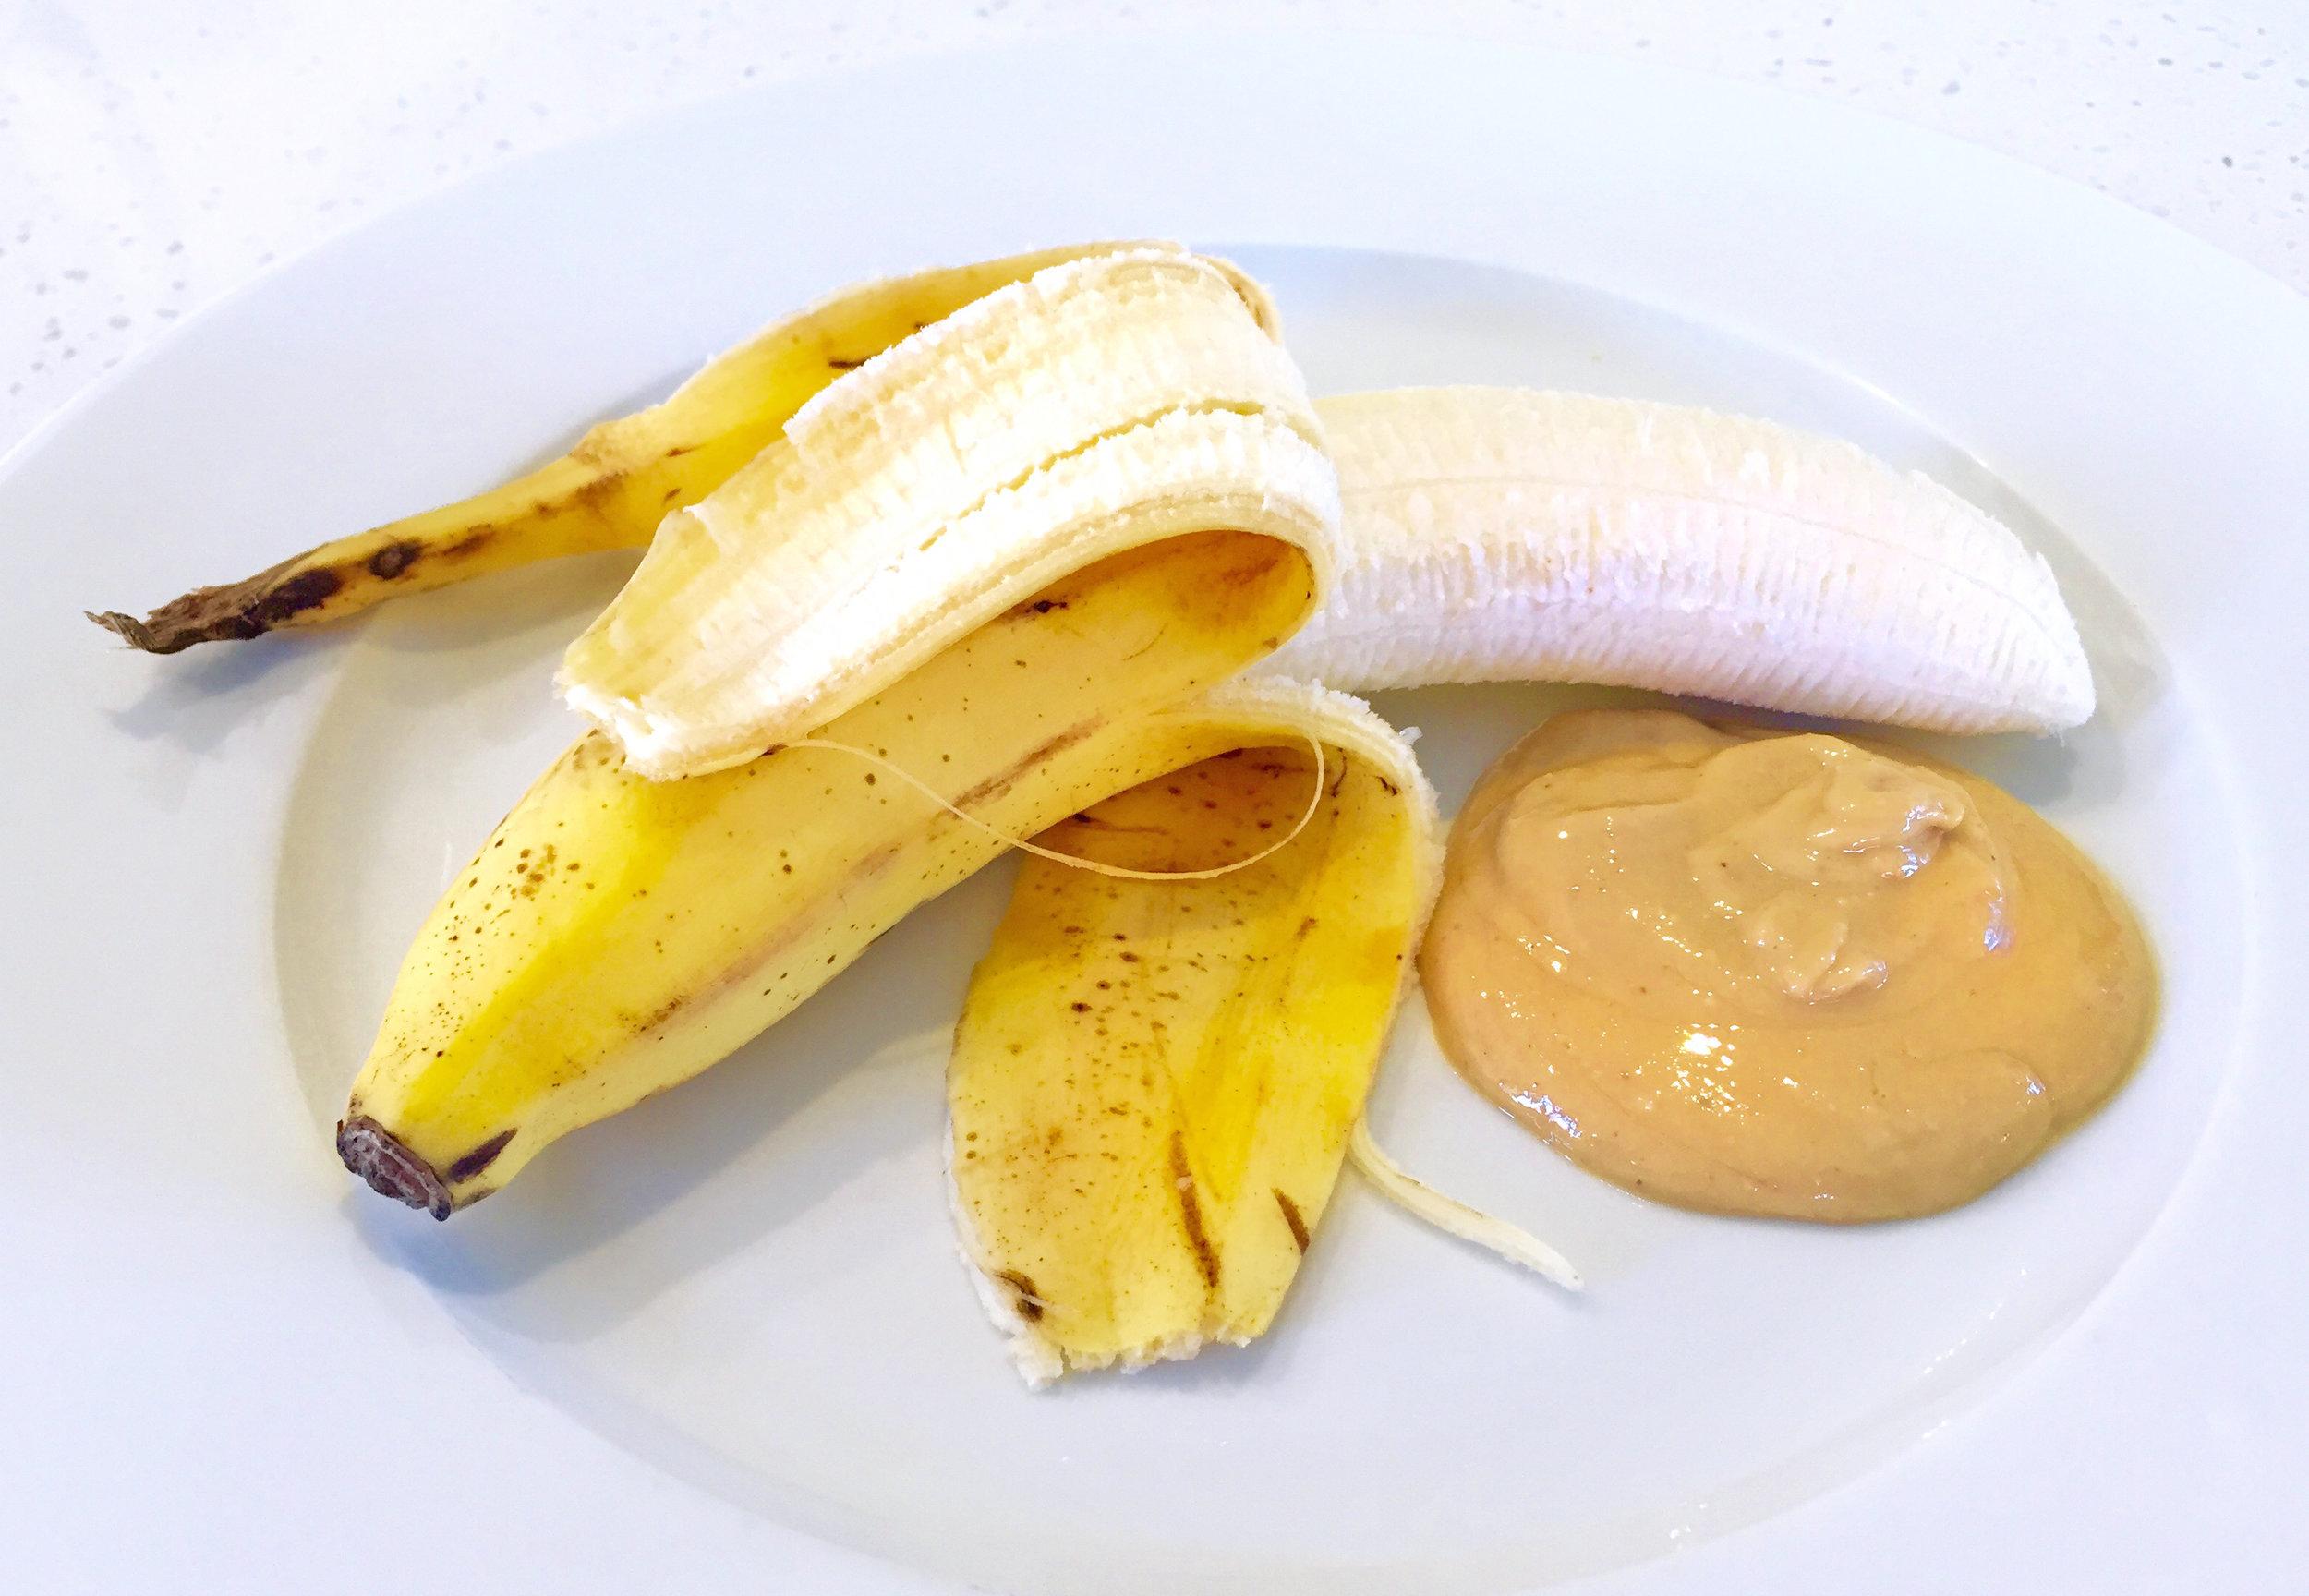 Snack - banana and almond butter.jpg